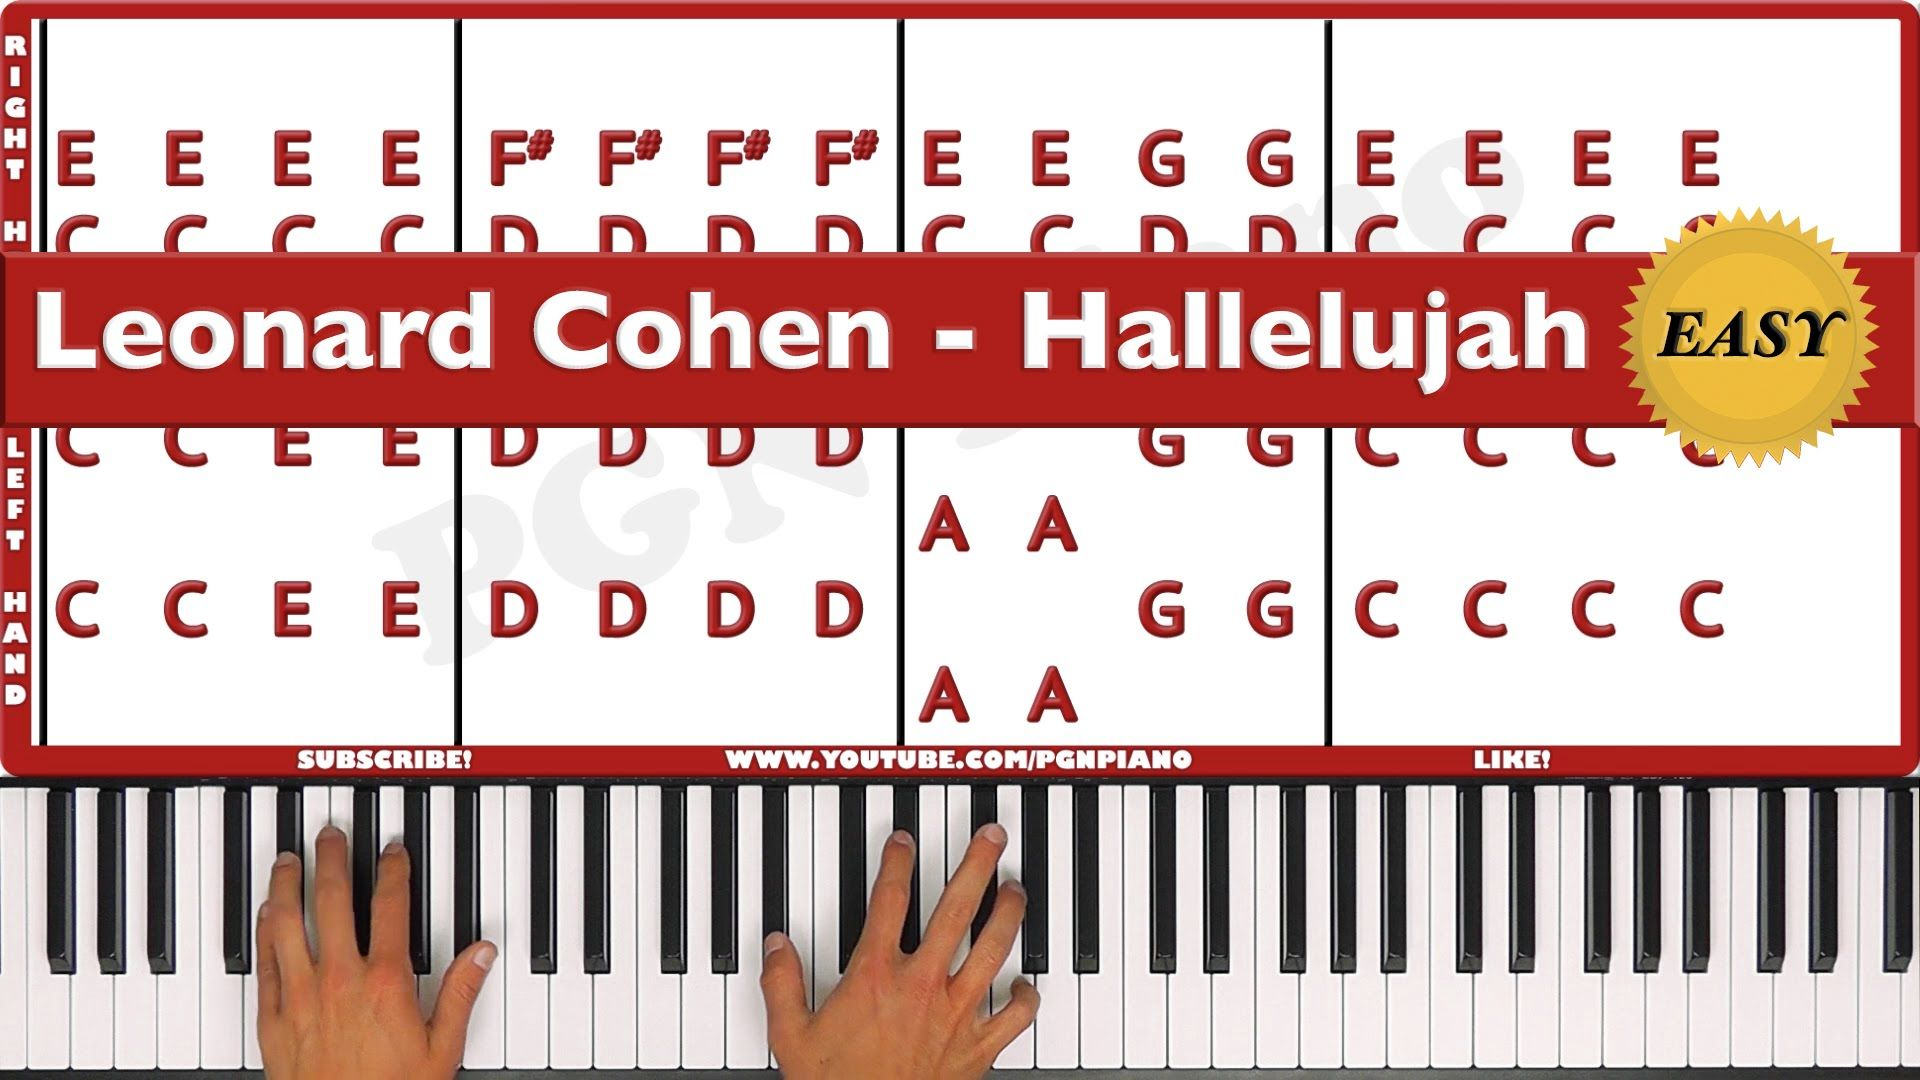 ♫ EASY - How To Play Hallelujah Leonard Cohen Piano